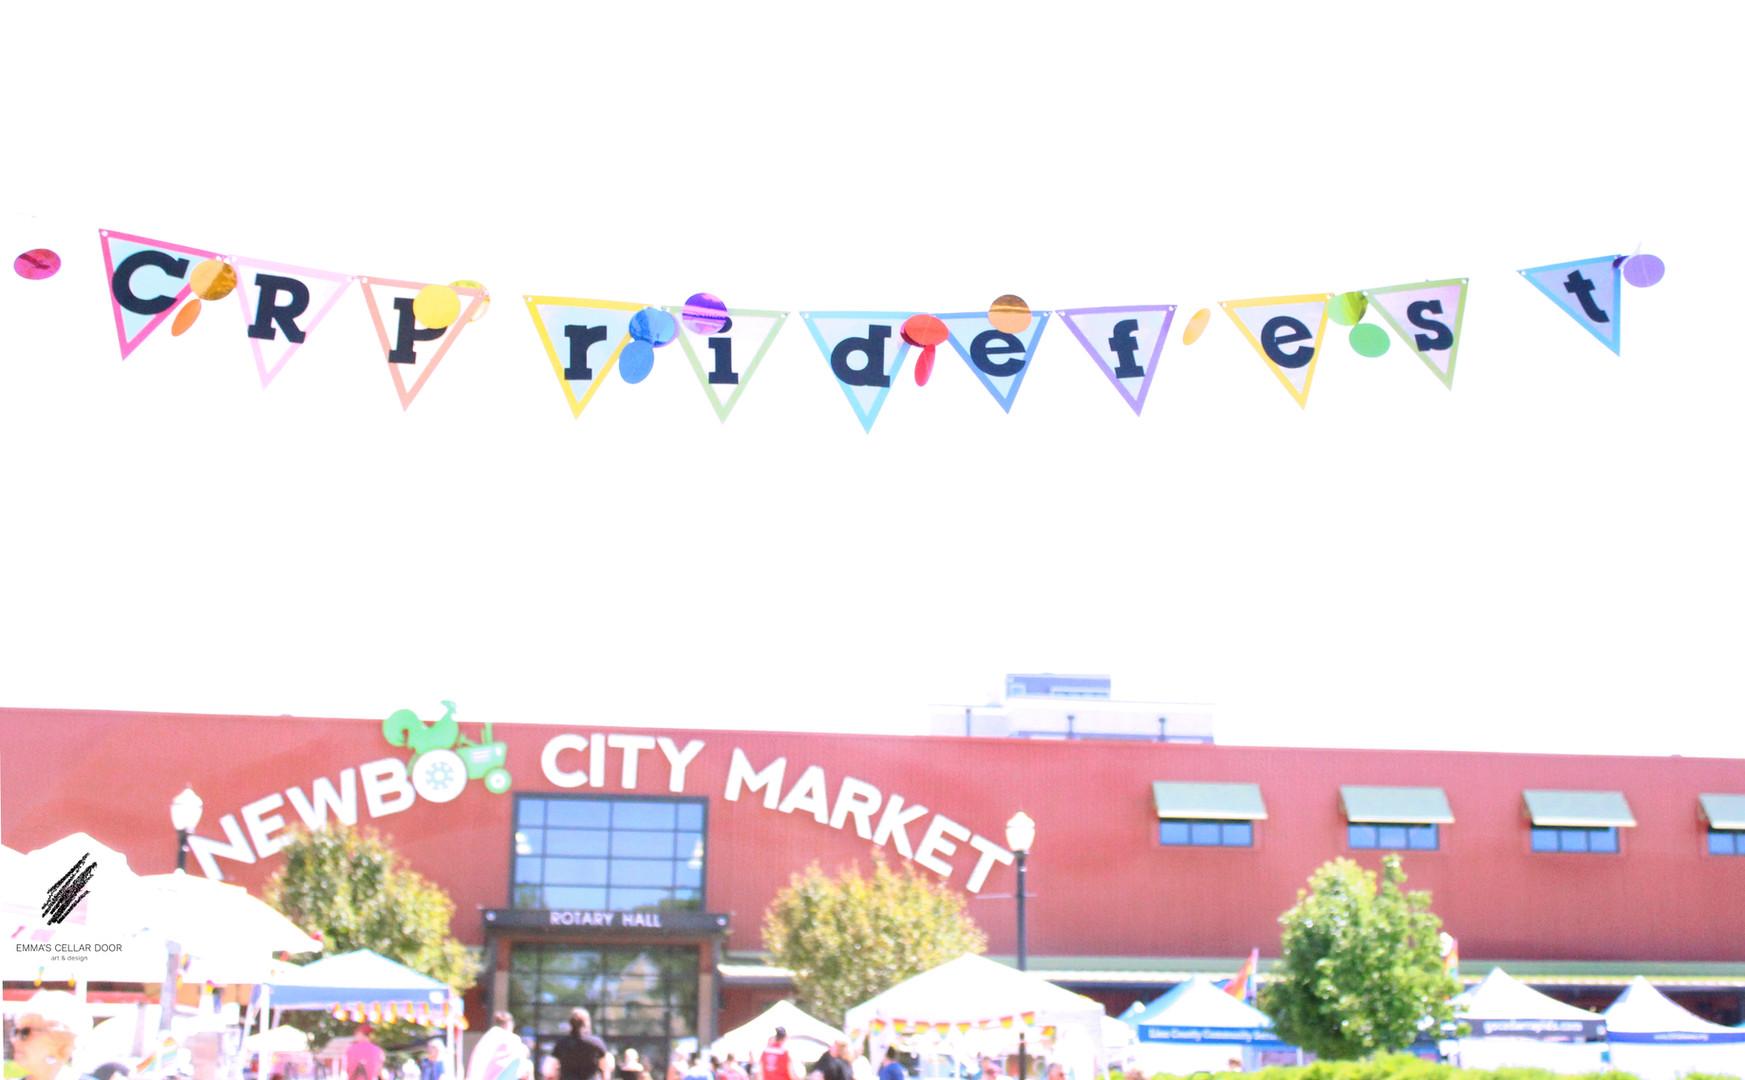 CRPrideFest at NewBo City Market